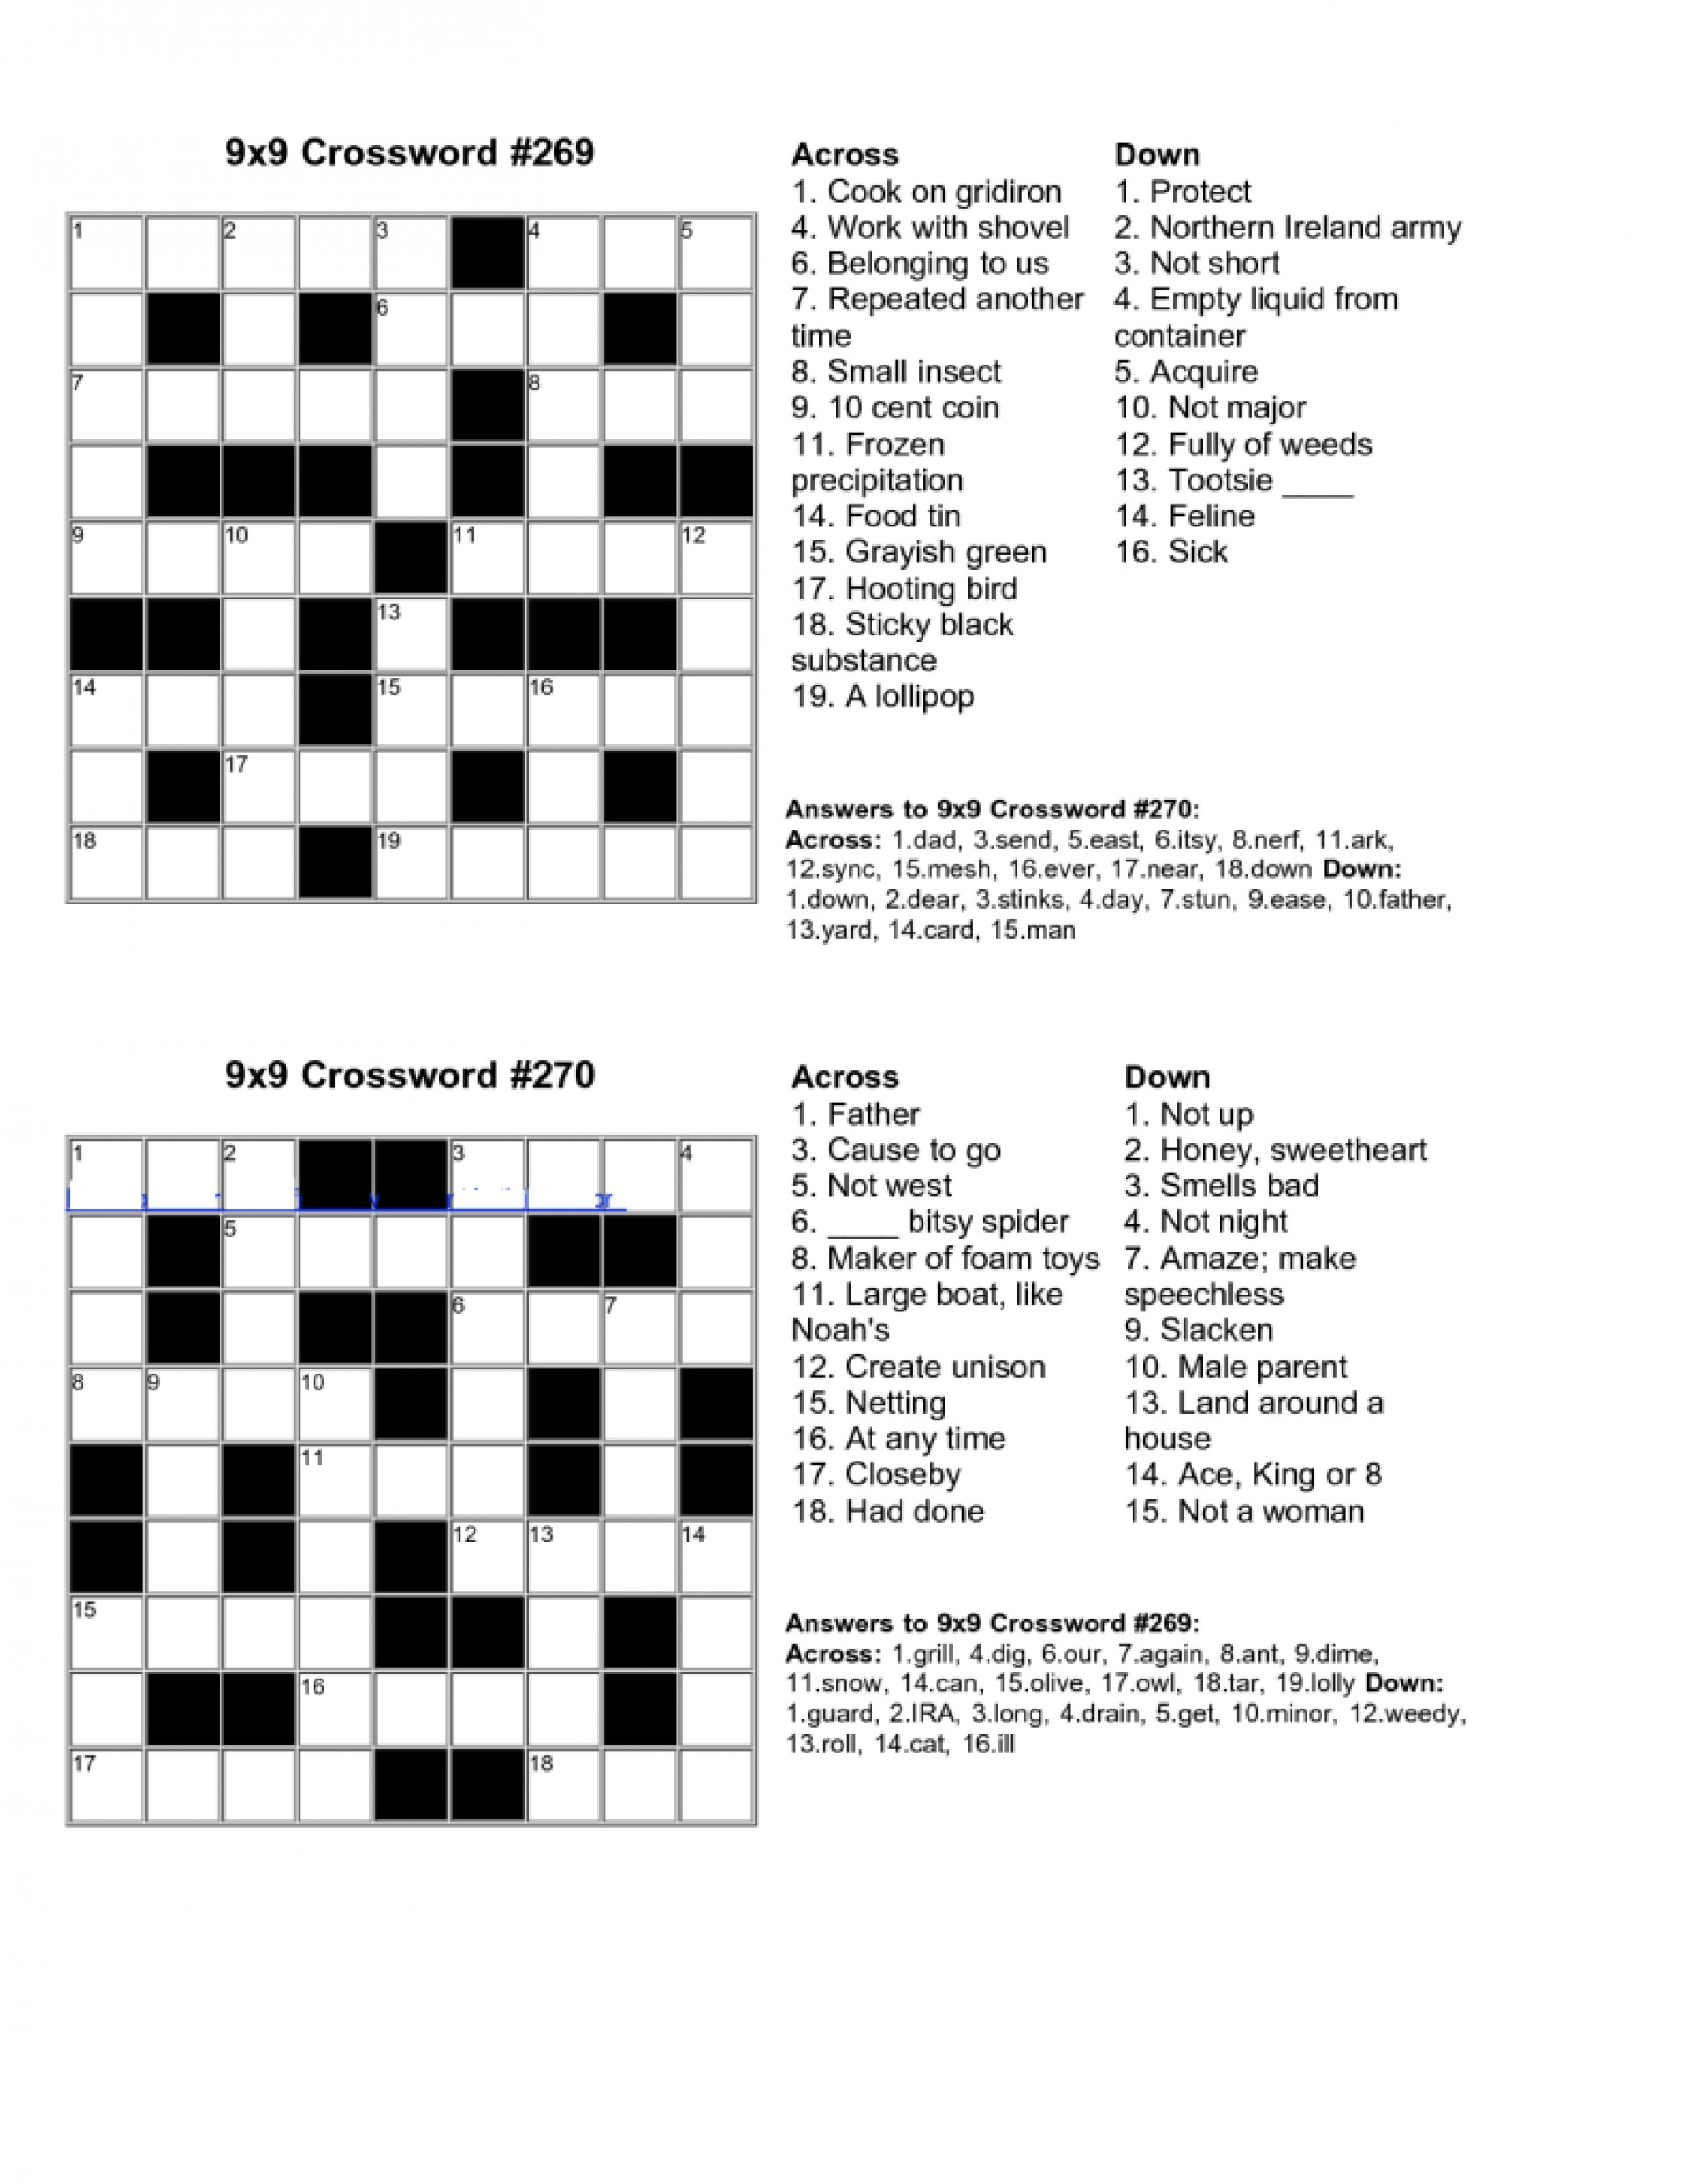 Free Crossword Puzzle Maker Printable - Stepindance.fr - Create A - Create Your Own Crossword Puzzle Printable